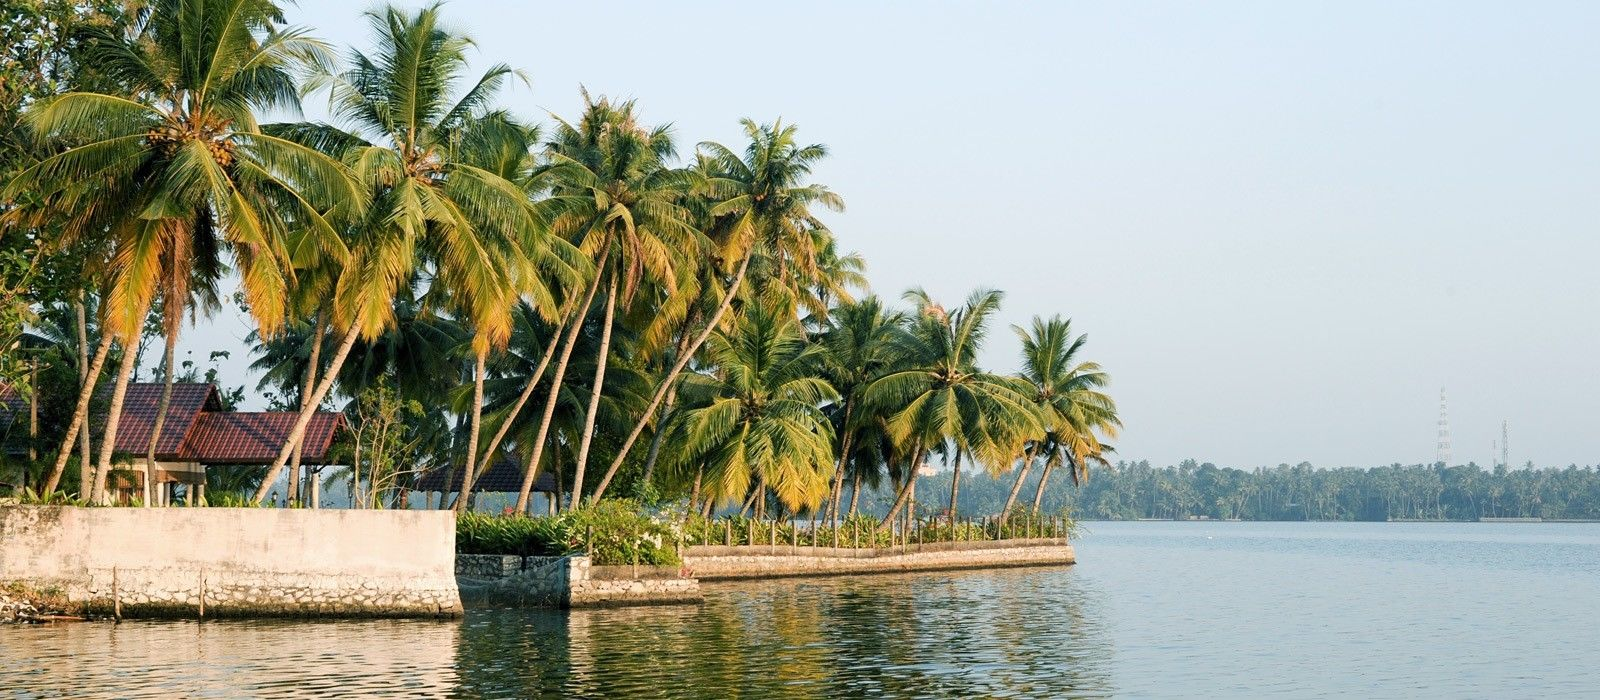 Destination Kumarakom South India